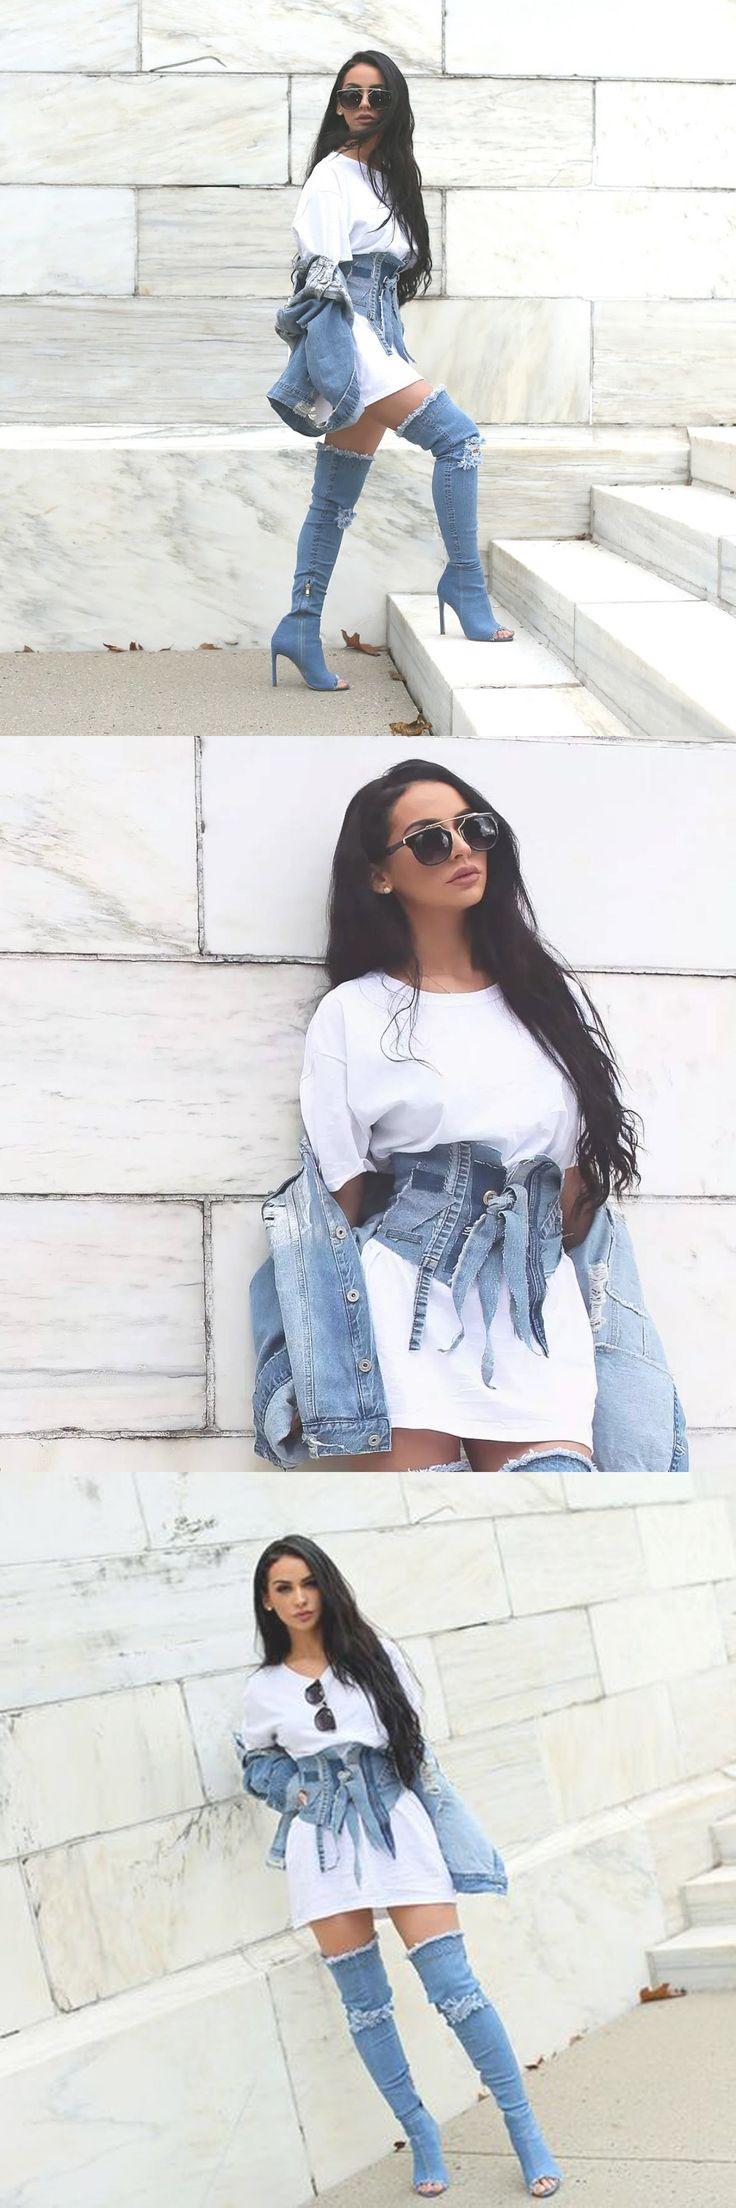 Carlibel Cute Outfit Ideas Summer 2017 Denim Thigh High Boots Denim Corset White T Shirt